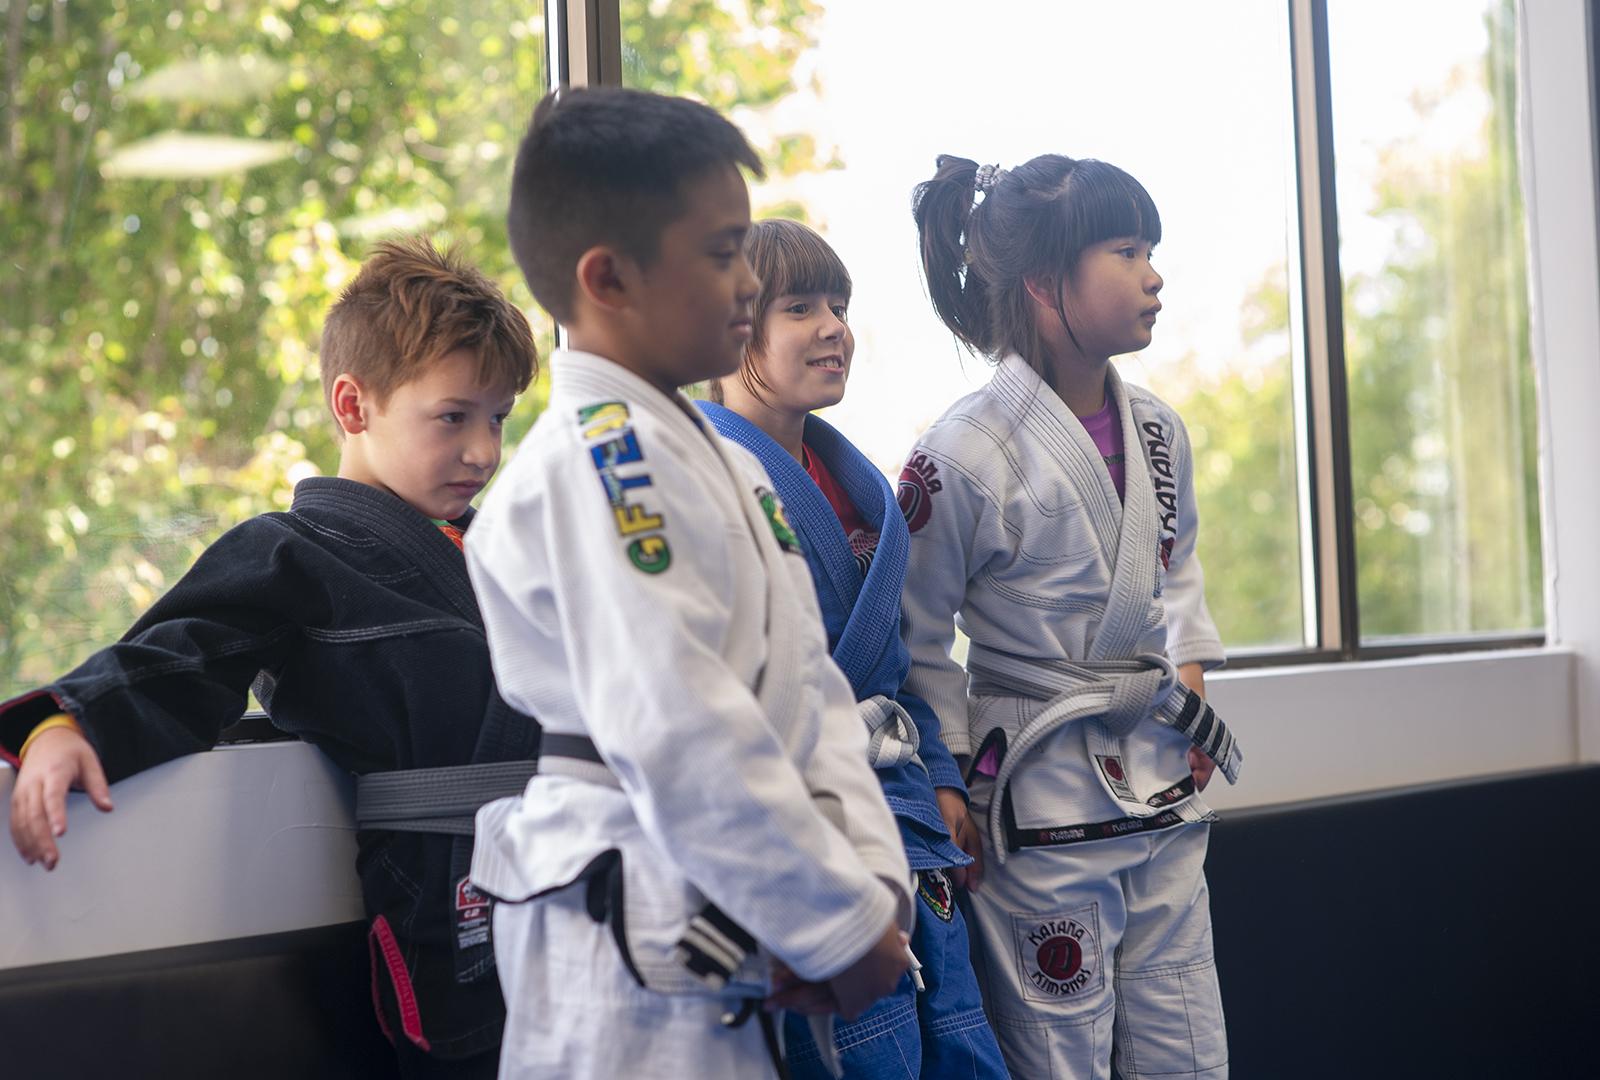 Junior Grapplers bjj kids program at GFTeam Canada in Burnaby